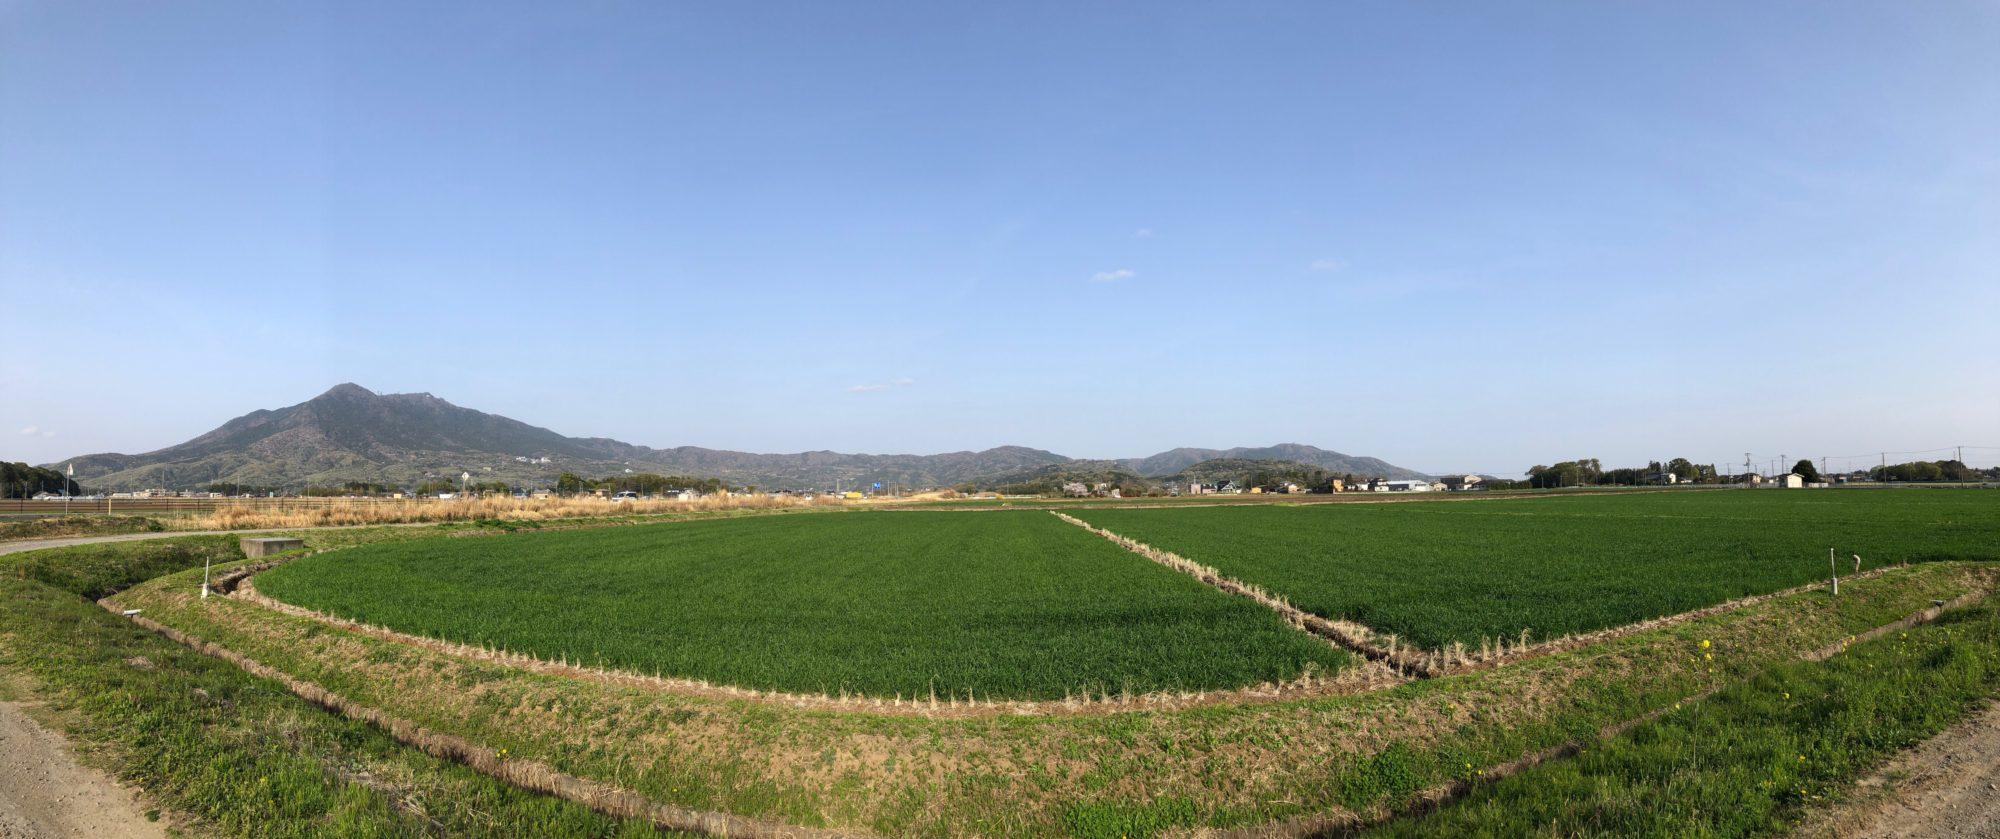 筑波山(左)と宝篋山(右端)